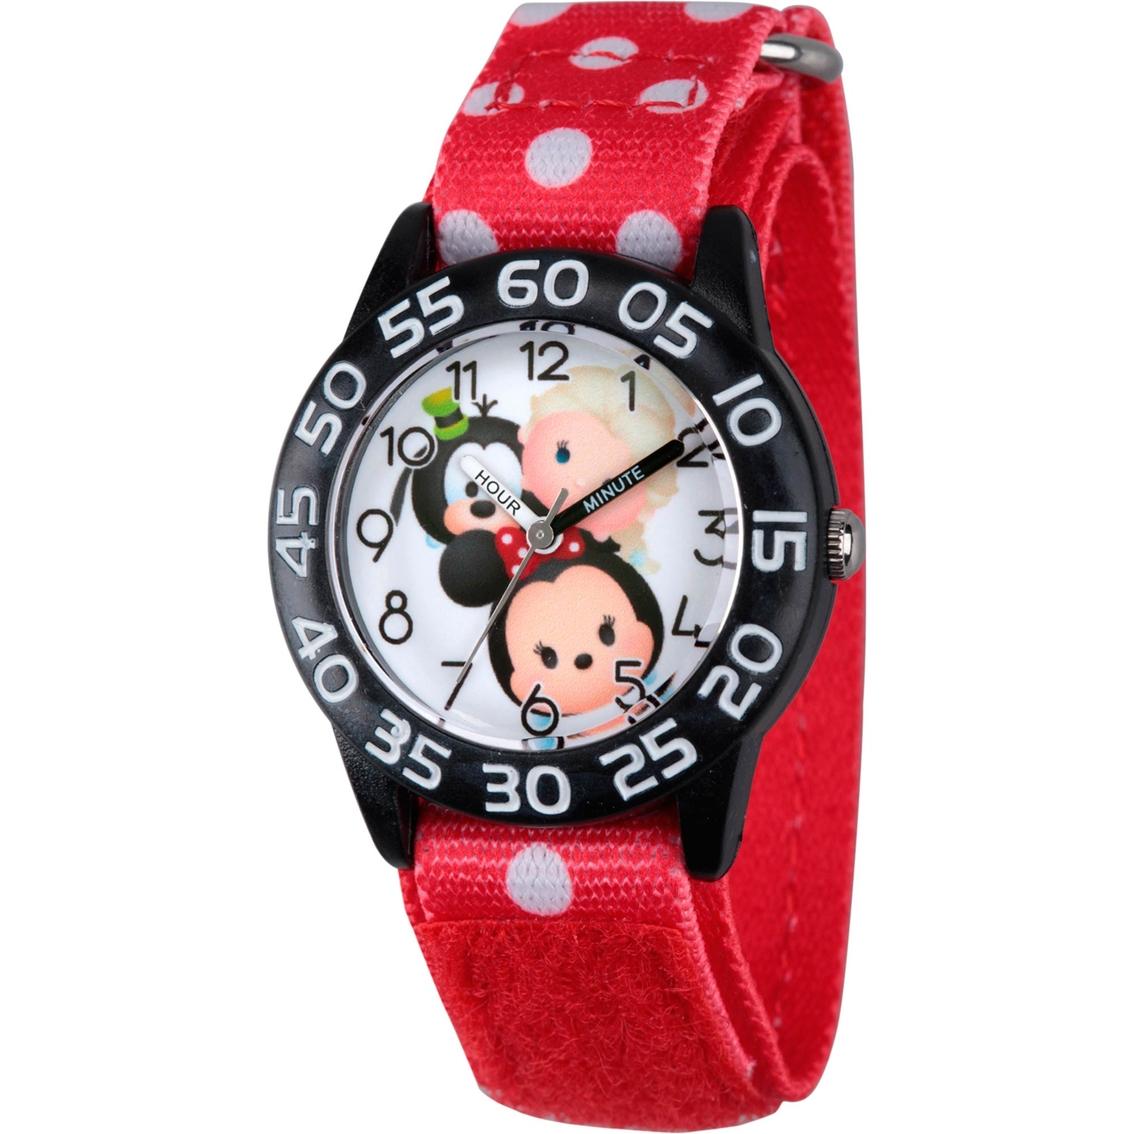 Disney tsum tsum time teacher watch w003012 children 39 s watches jewelry watches shop the for Tsum tsum watch